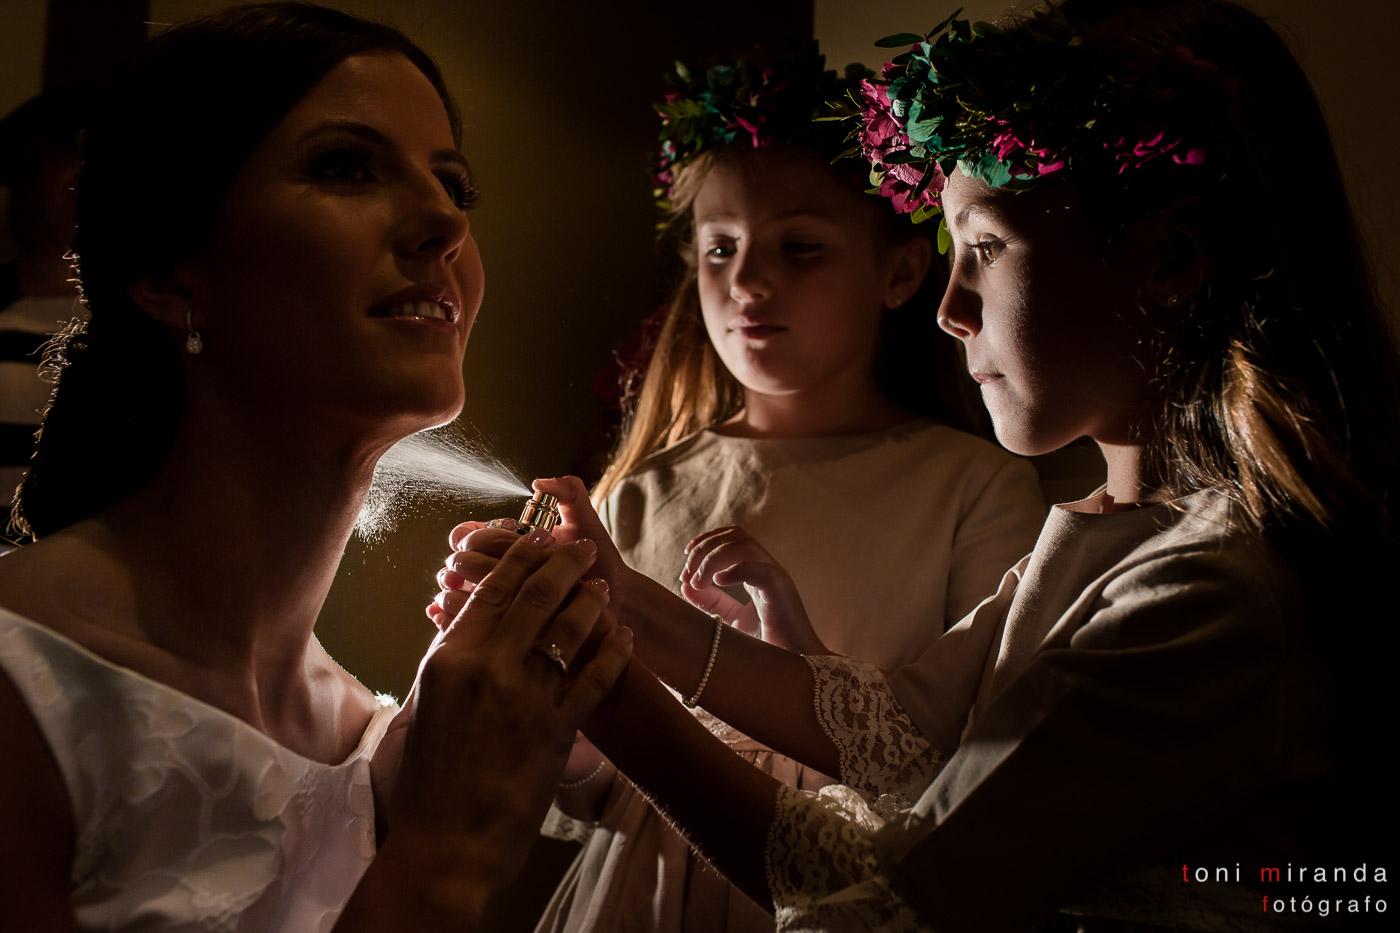 Preparativos de la novia con sobrinas tirando perfume